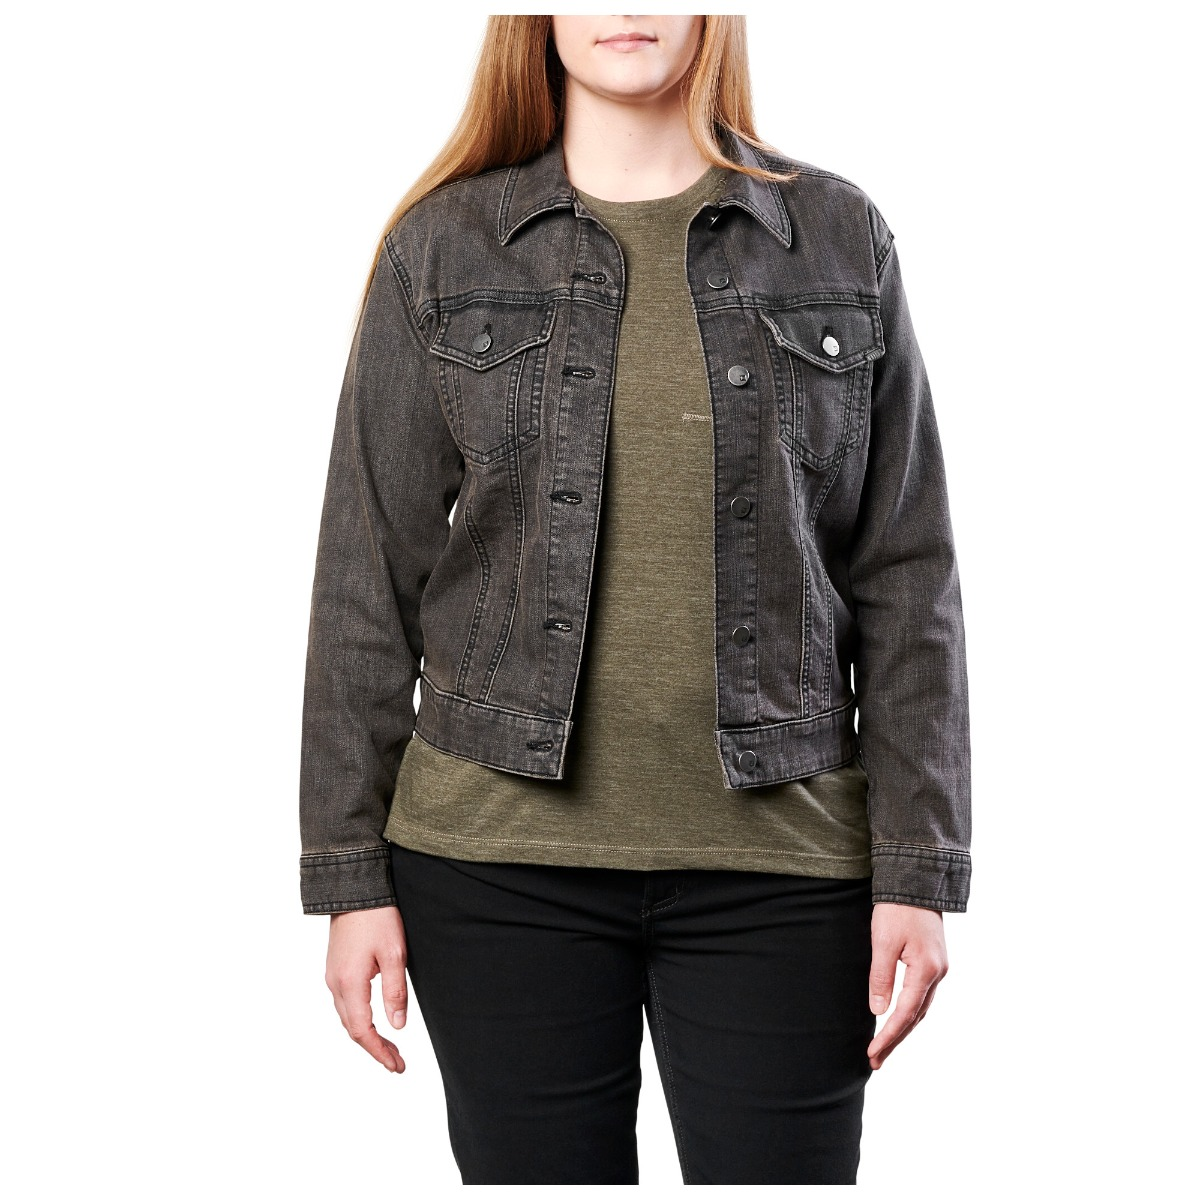 5.11 Tactical Women's Sloane Denim Jacket thumbnail